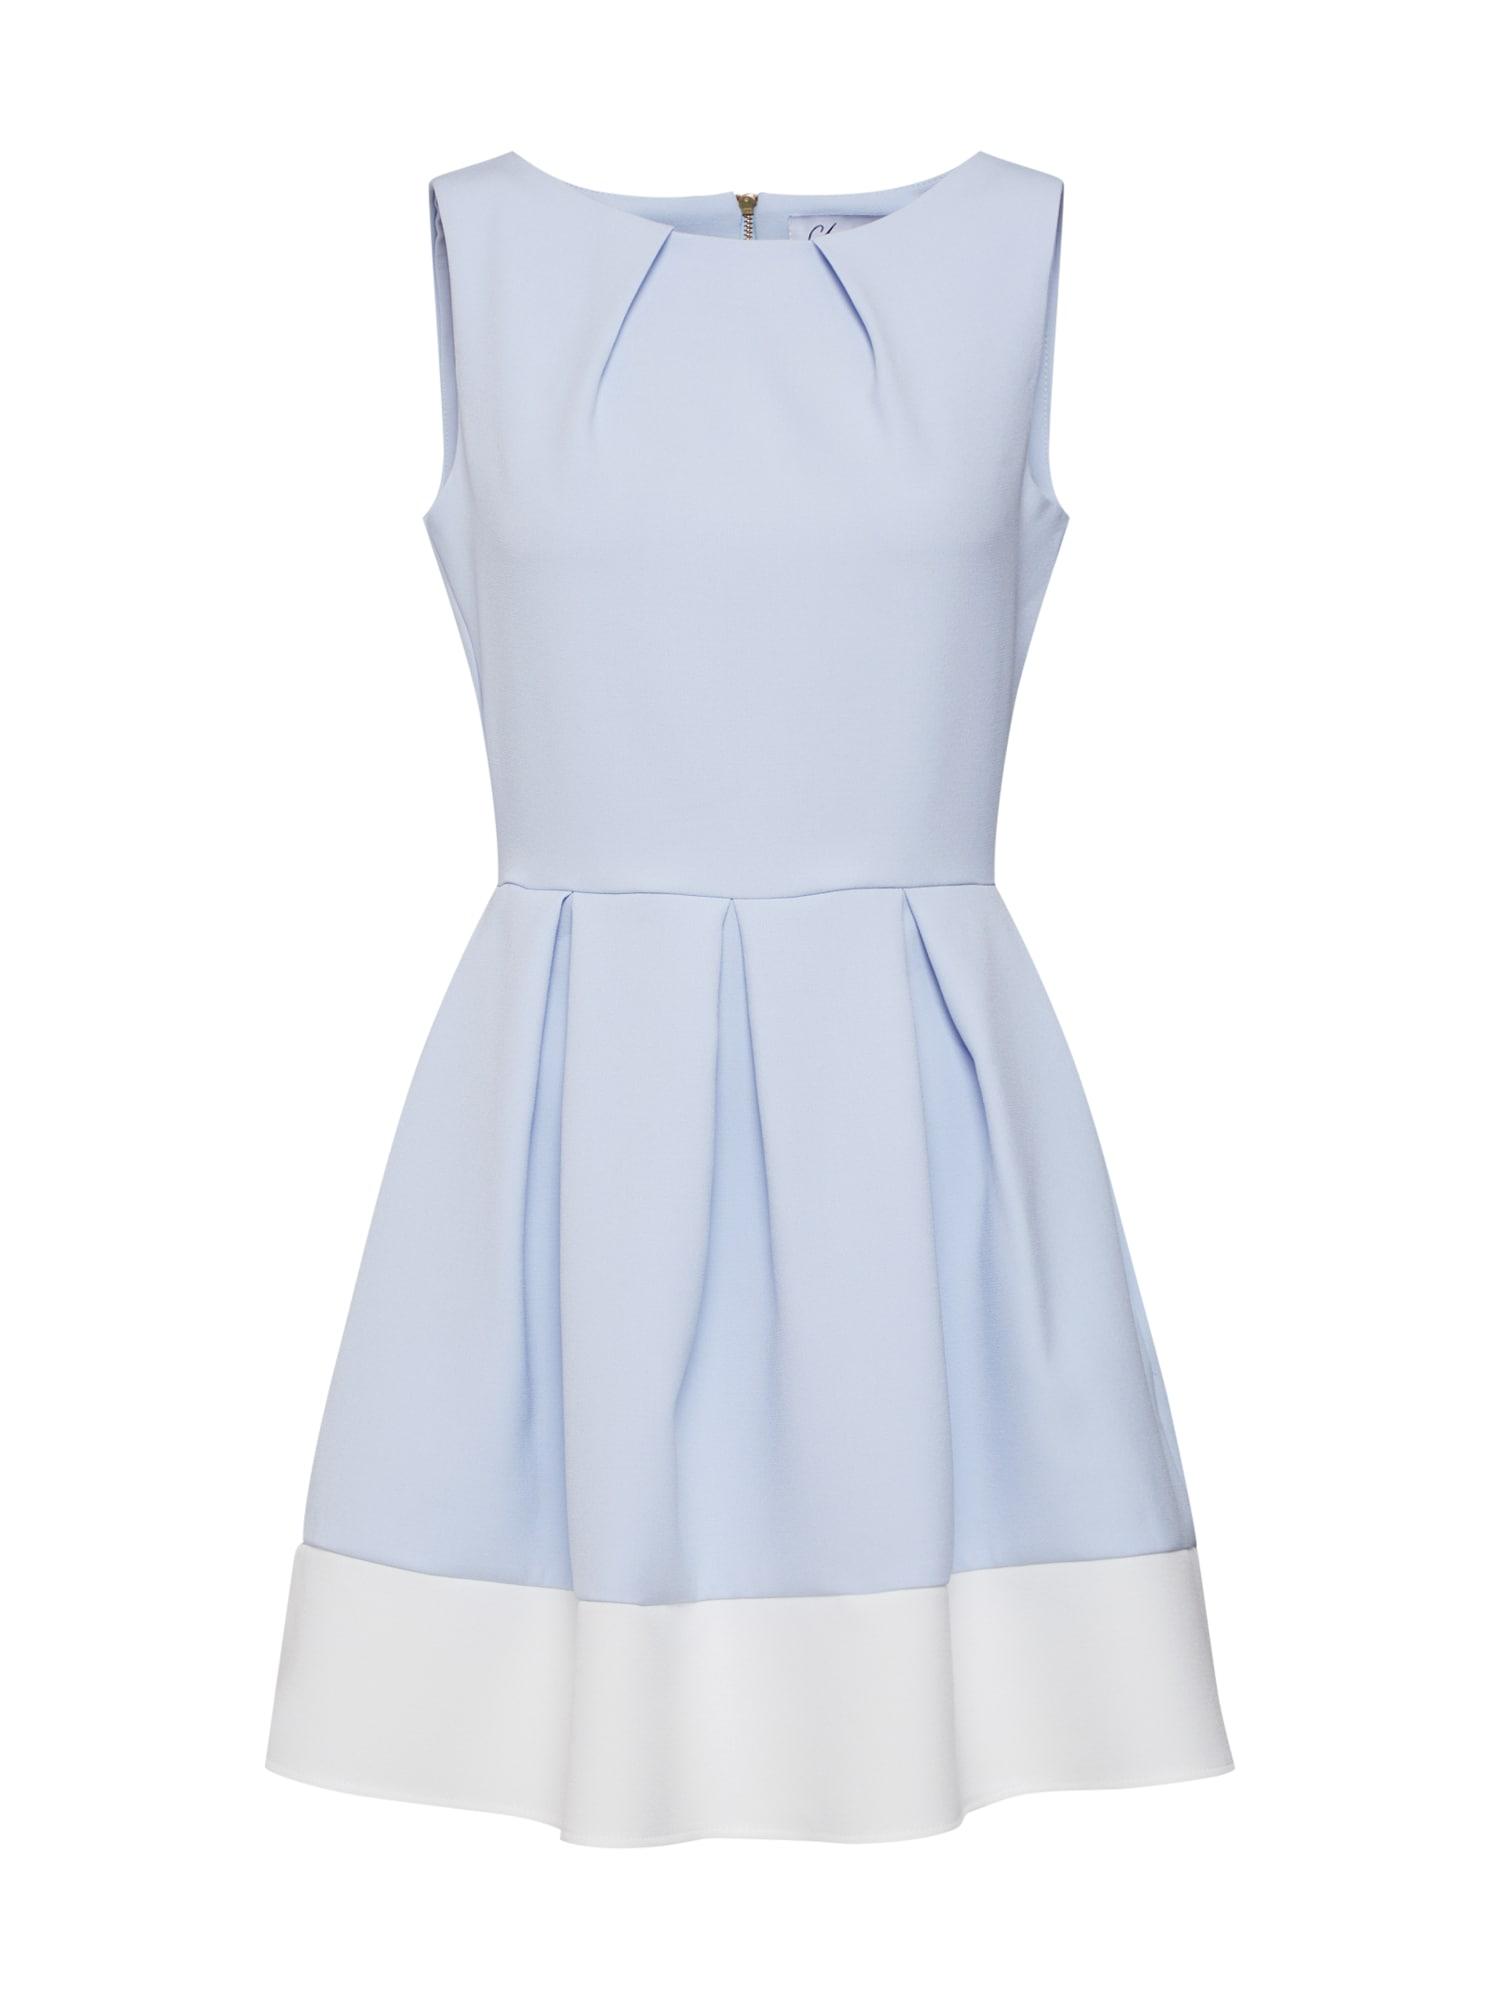 Closet London Trumpa kokteilinė suknelė mėlyna dūmų spalva / balkšva